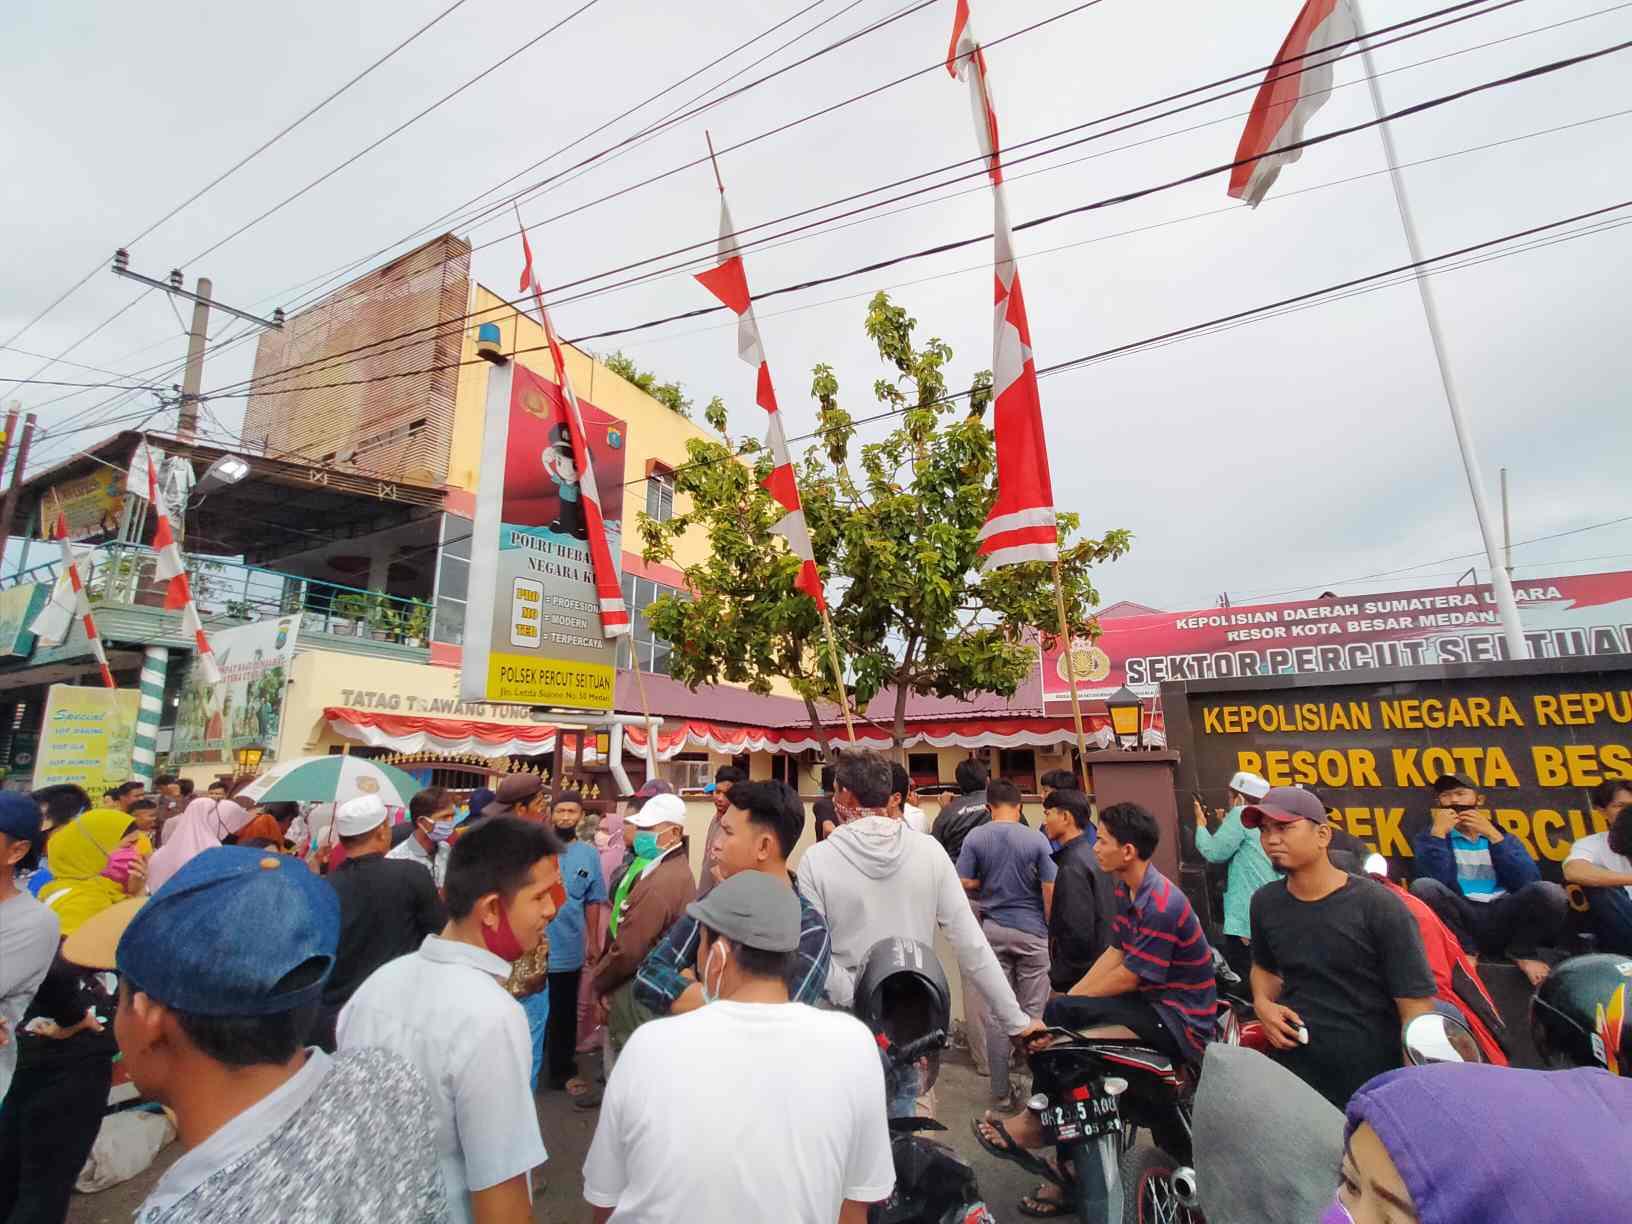 BREAKING NEWS : Puluhan Warga Desa Sei Rotan Demo Polsek Percut, Minta Warga Dibebaskan